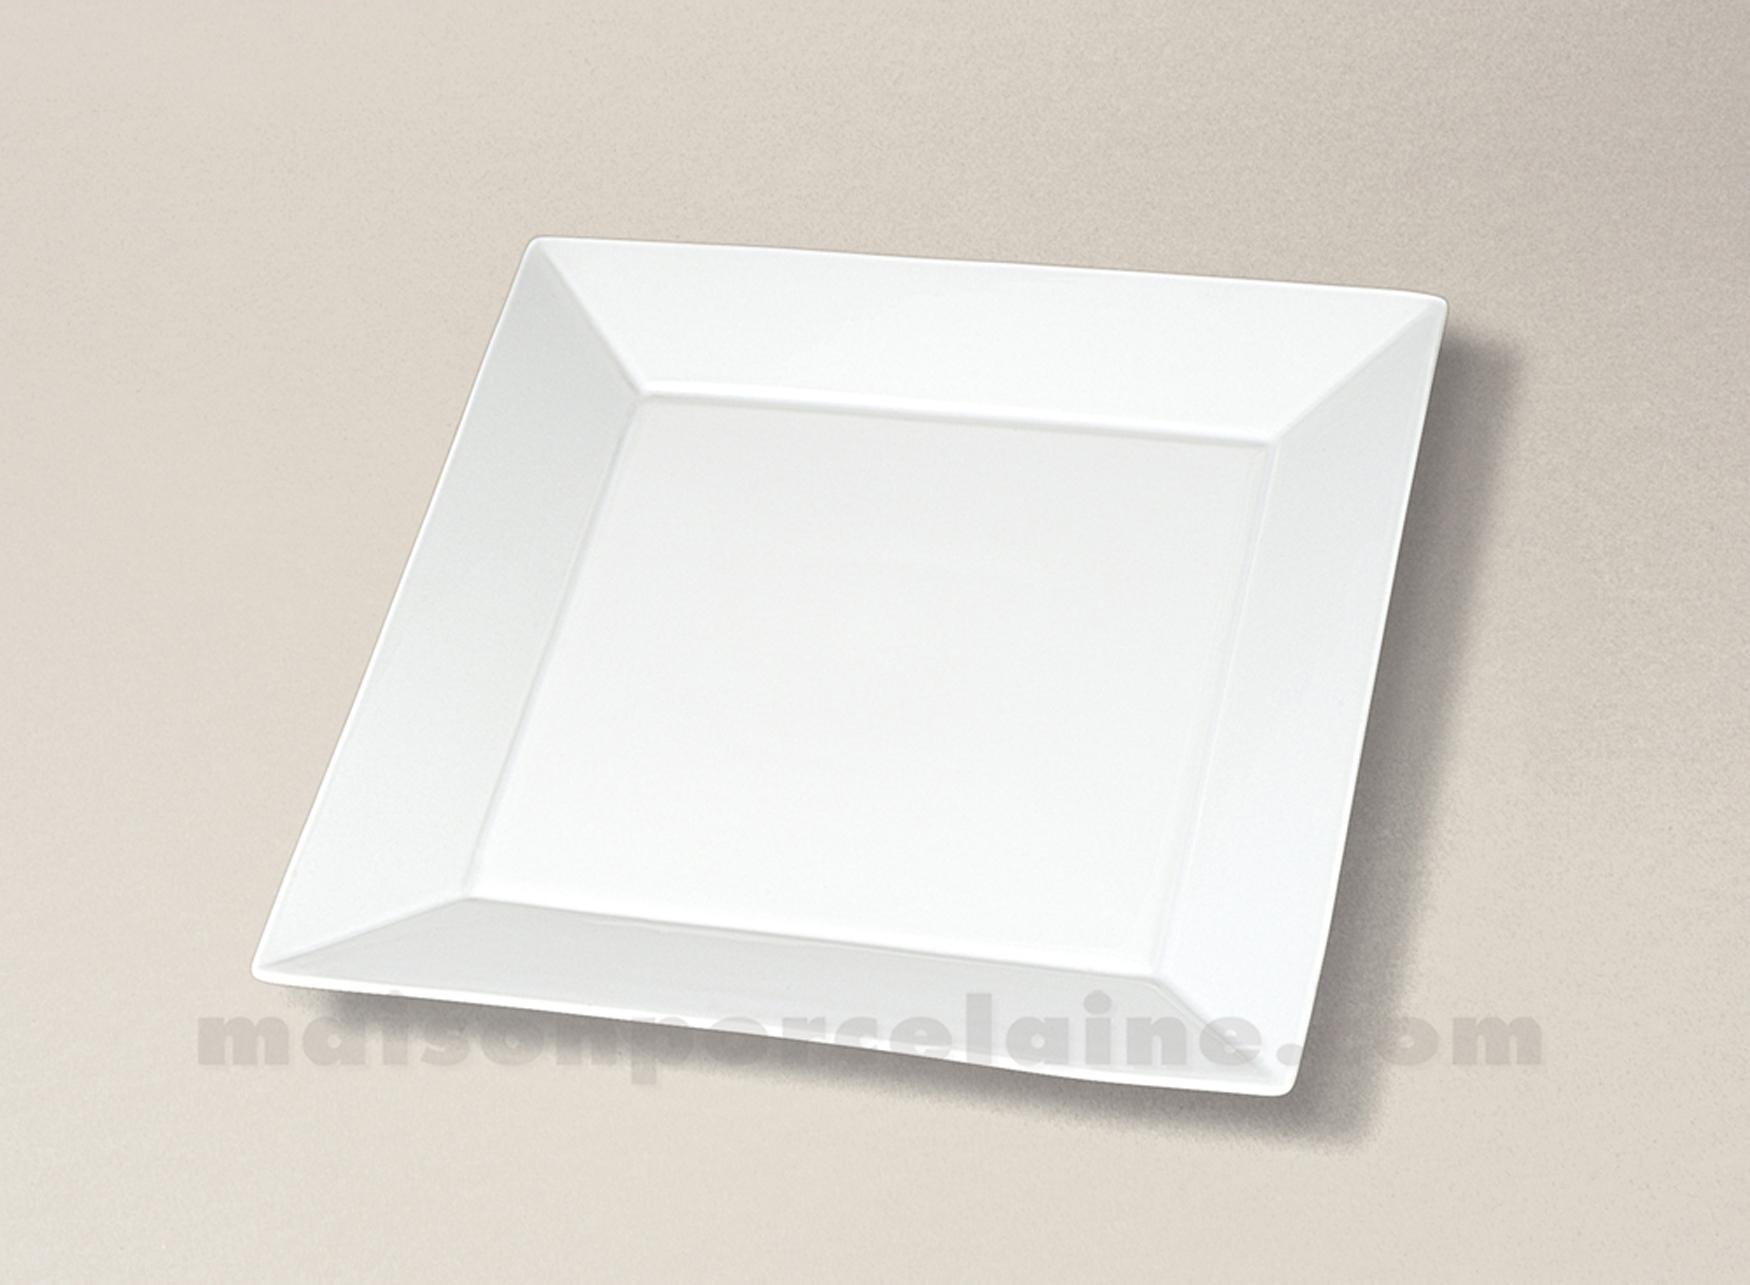 assiette carree plate porcelaine blanche kyoto 21x21. Black Bedroom Furniture Sets. Home Design Ideas